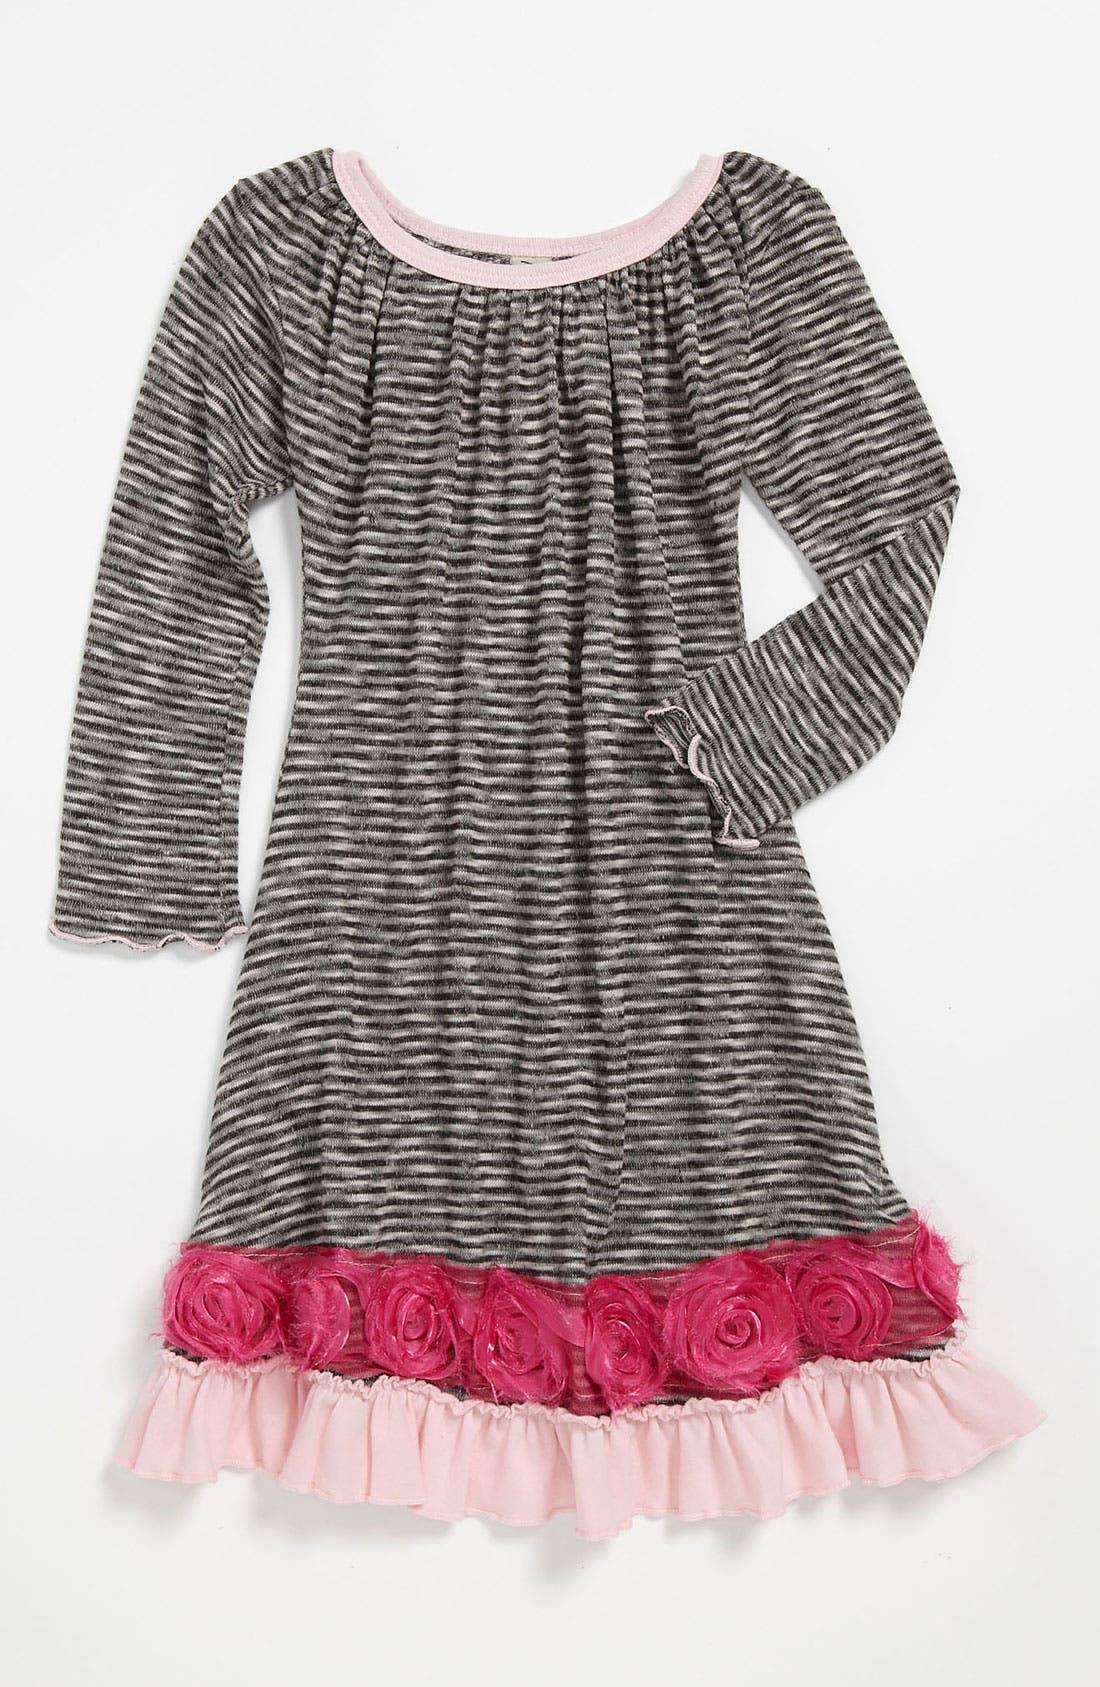 Main Image - Mignone Stripe Dress (Toddler)